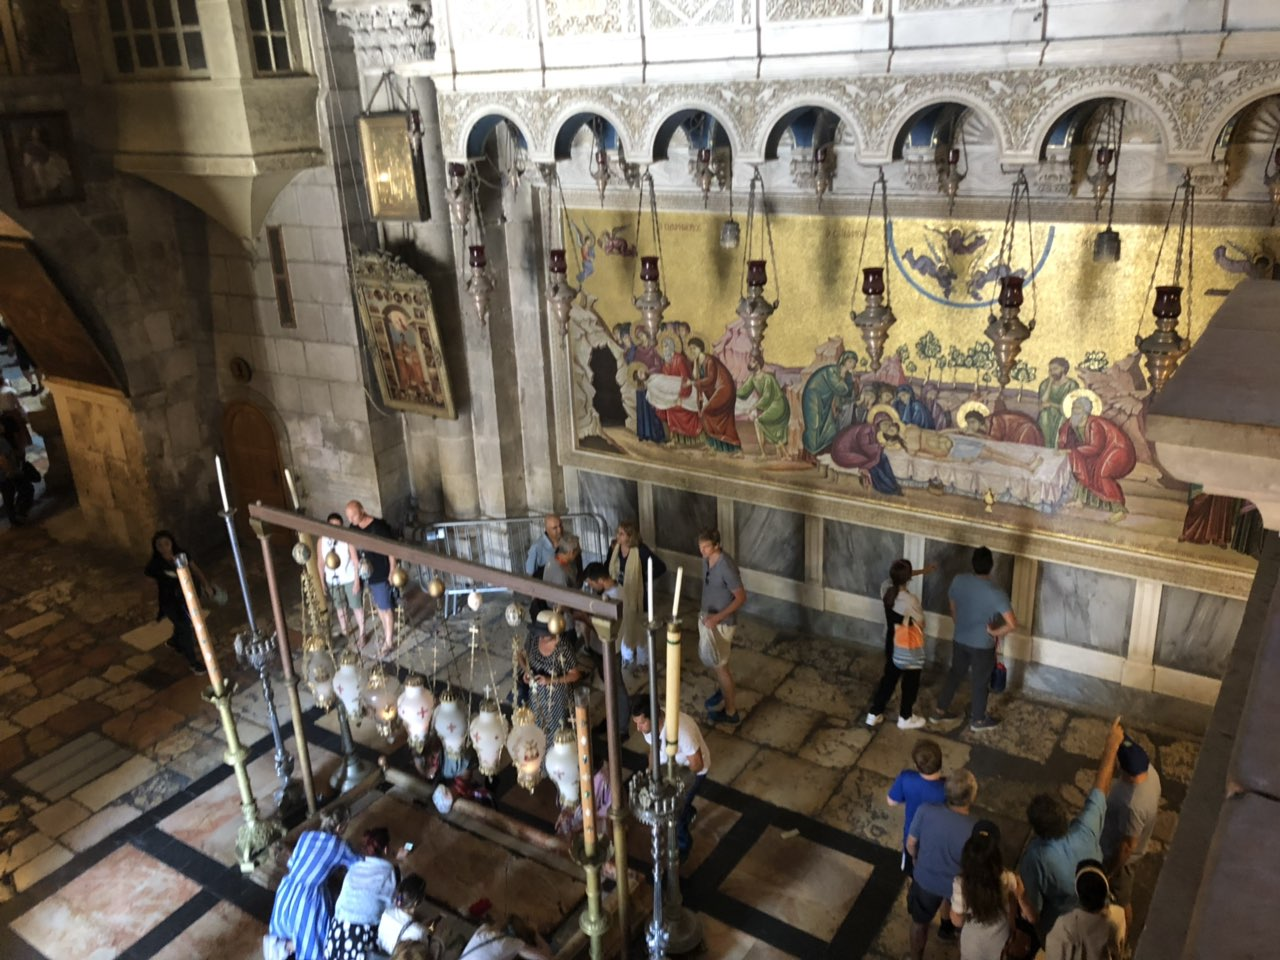 ierosolyma2019 10 - Λαρισαίοι Προσκυνητές Στην Αγία Γη Των Ιεροσολύμων (φωτο)